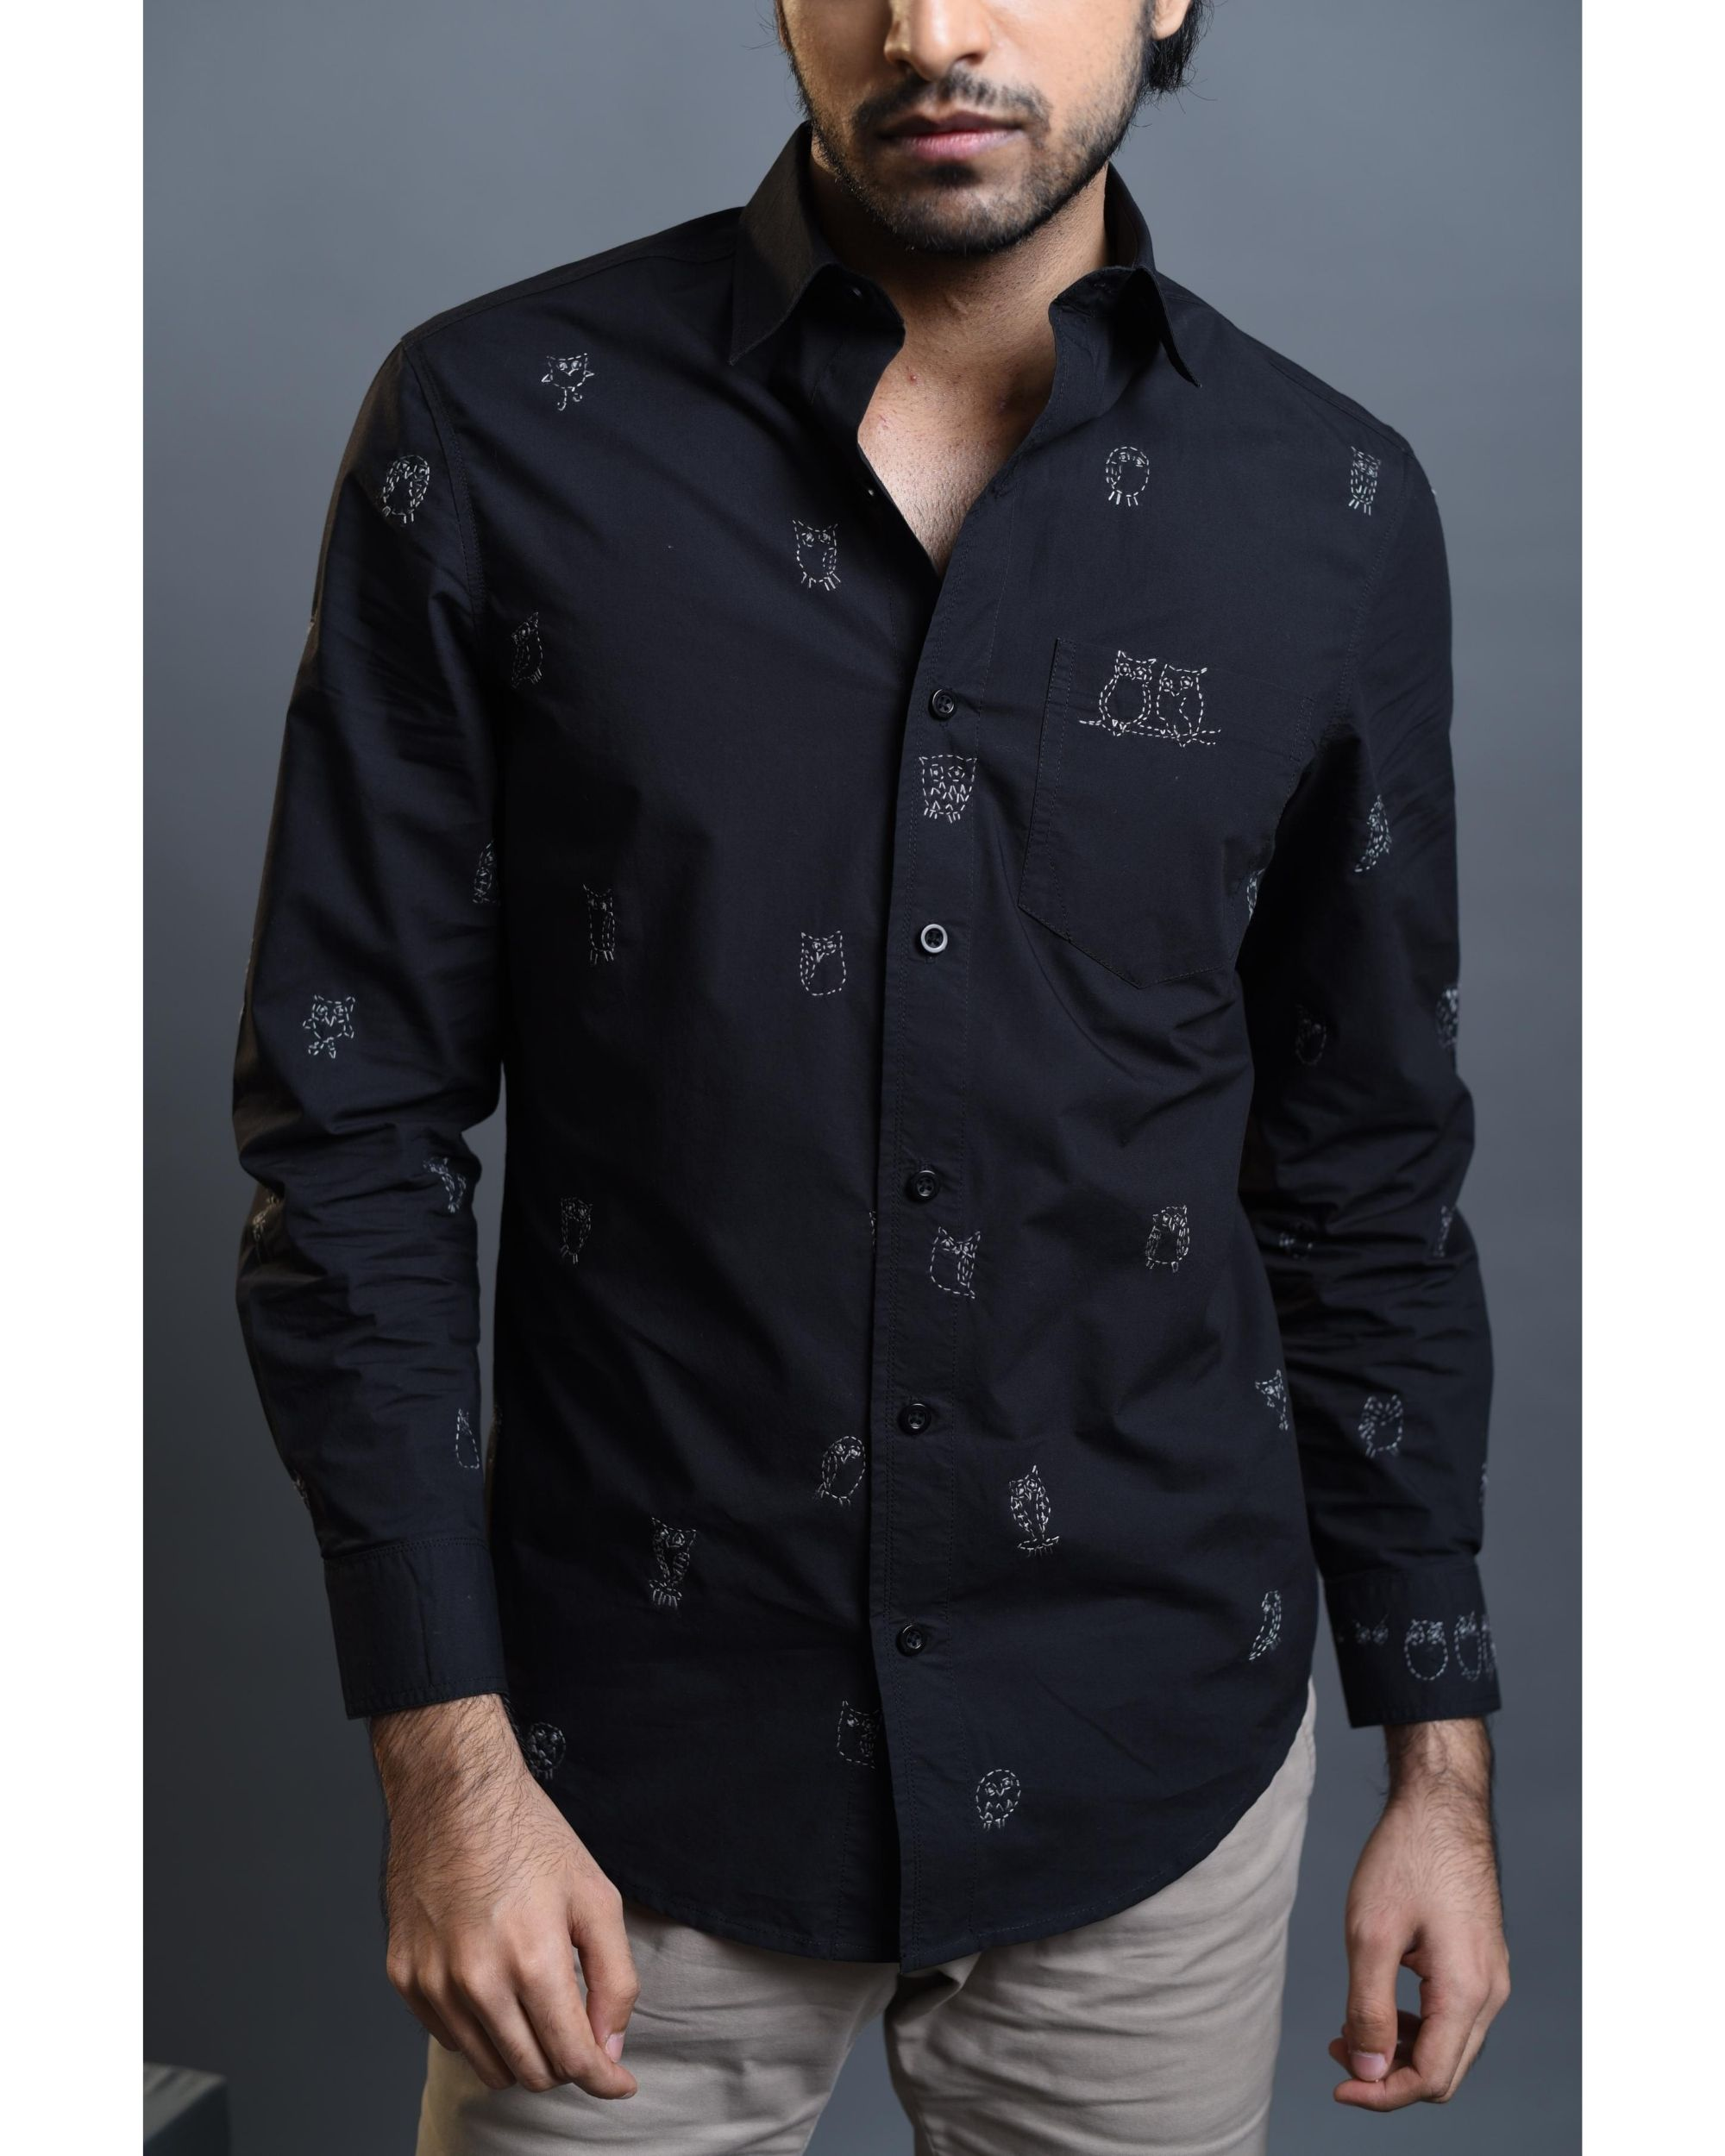 Black owl embroidered shirt